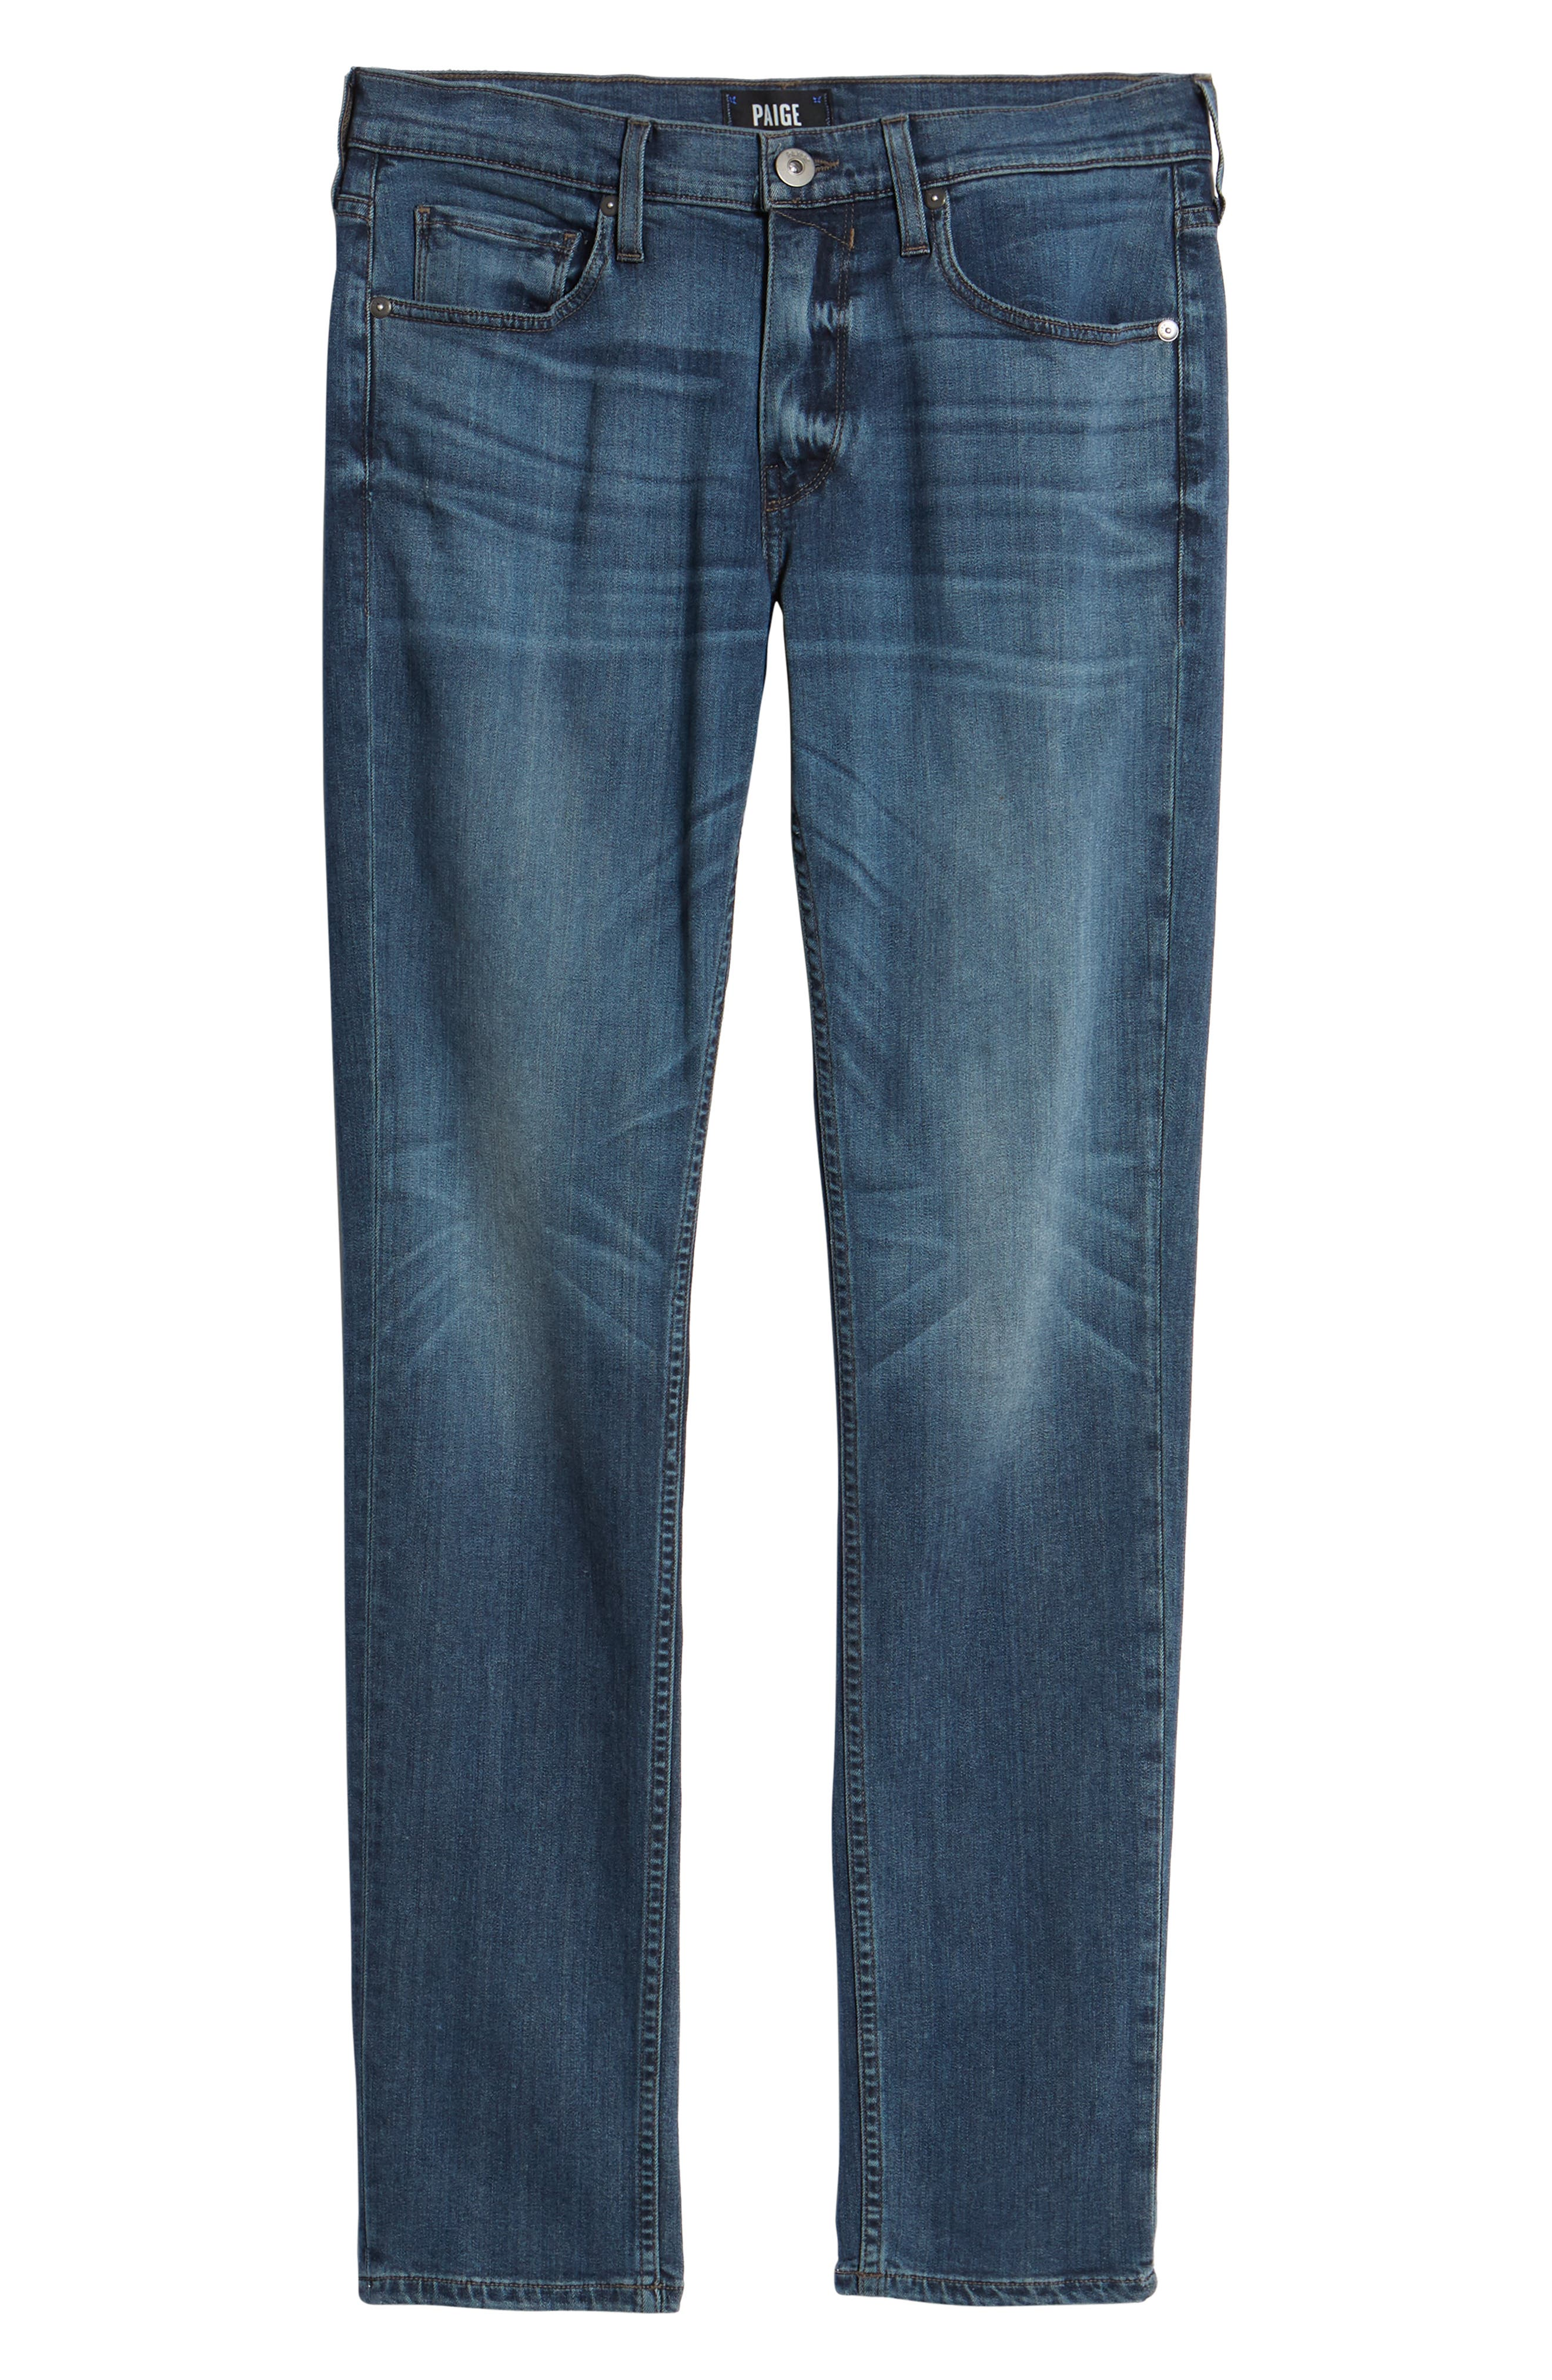 Transcend - Croft Skinny Fit Jeans,                             Alternate thumbnail 6, color,                             GRAMMERCY